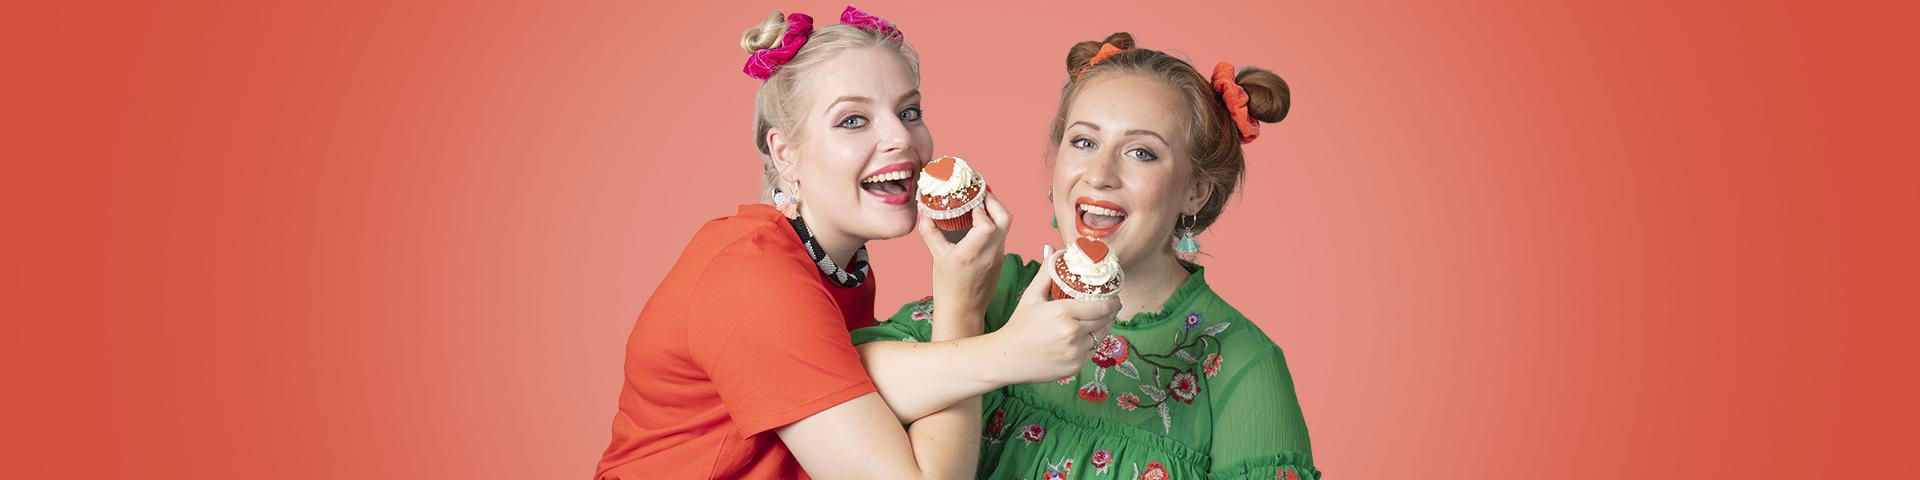 Verse cupcakes afhalen of bezorgd | Donuts + Bagels